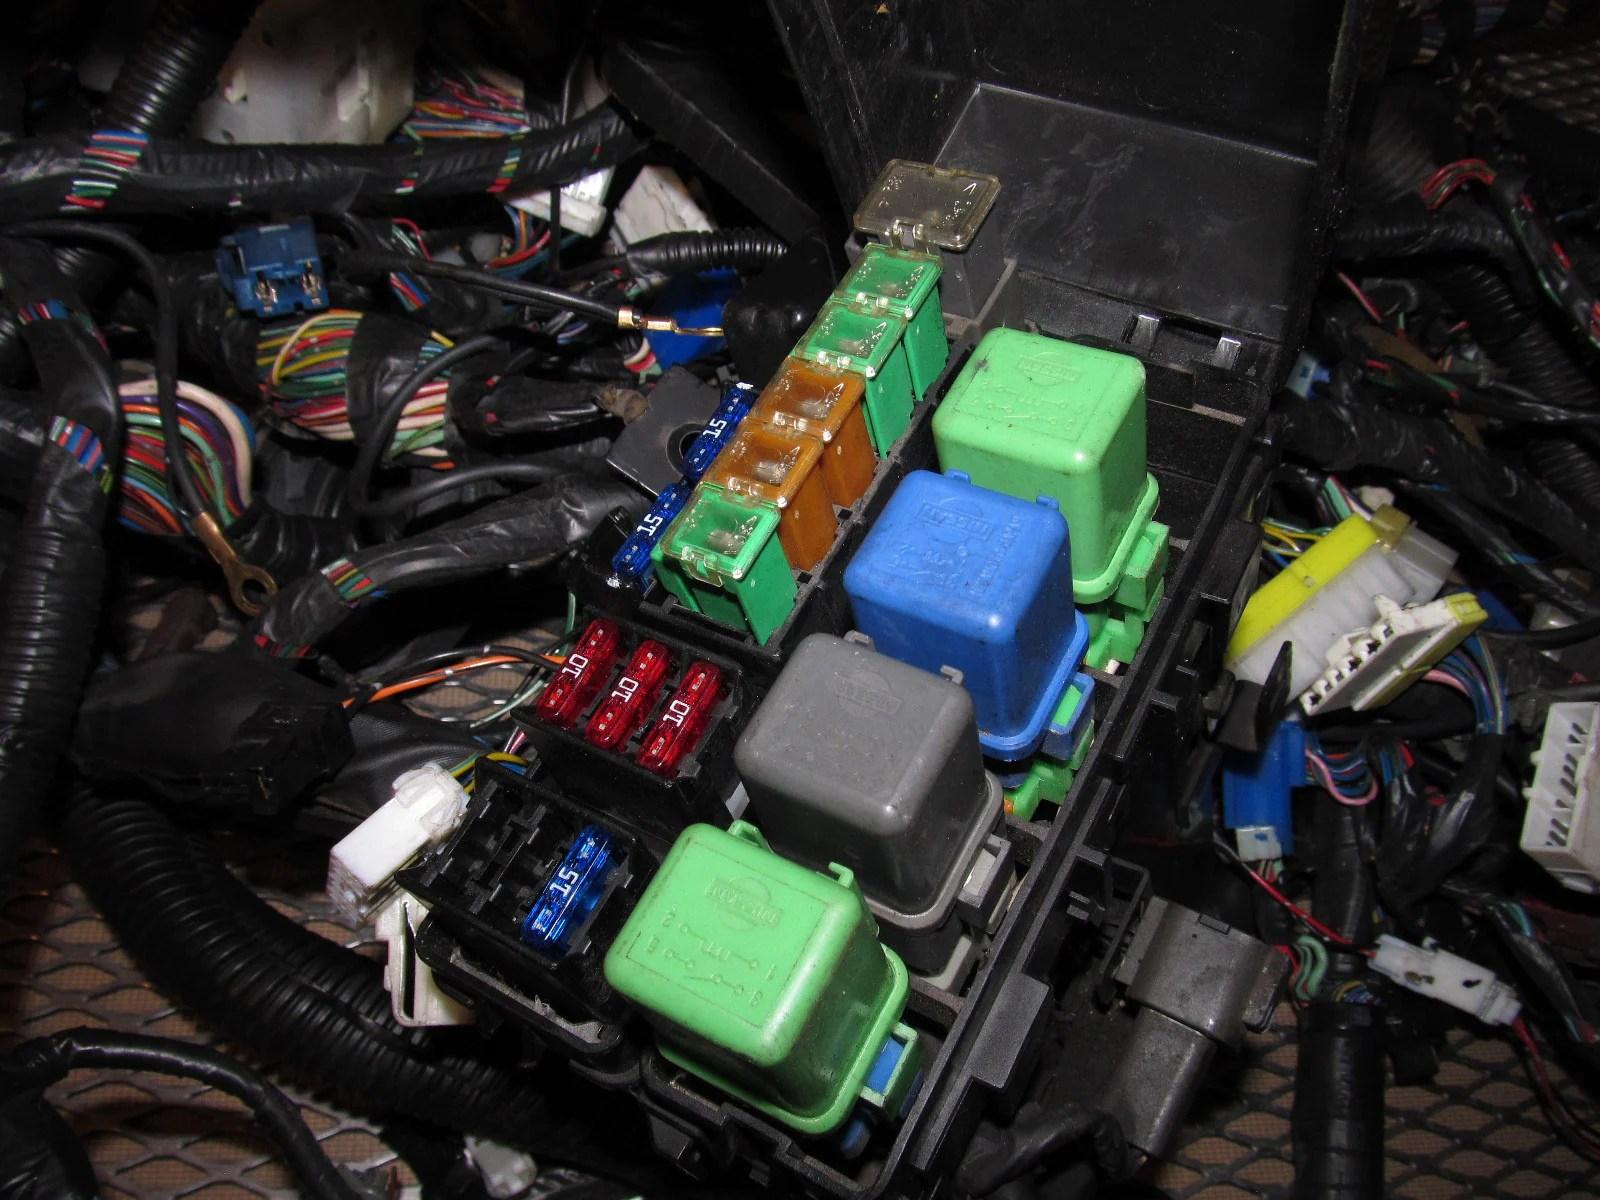 91 240sx ignition wiring diagram electron dot for calcium 87 toyota corolla fuse box van wagon